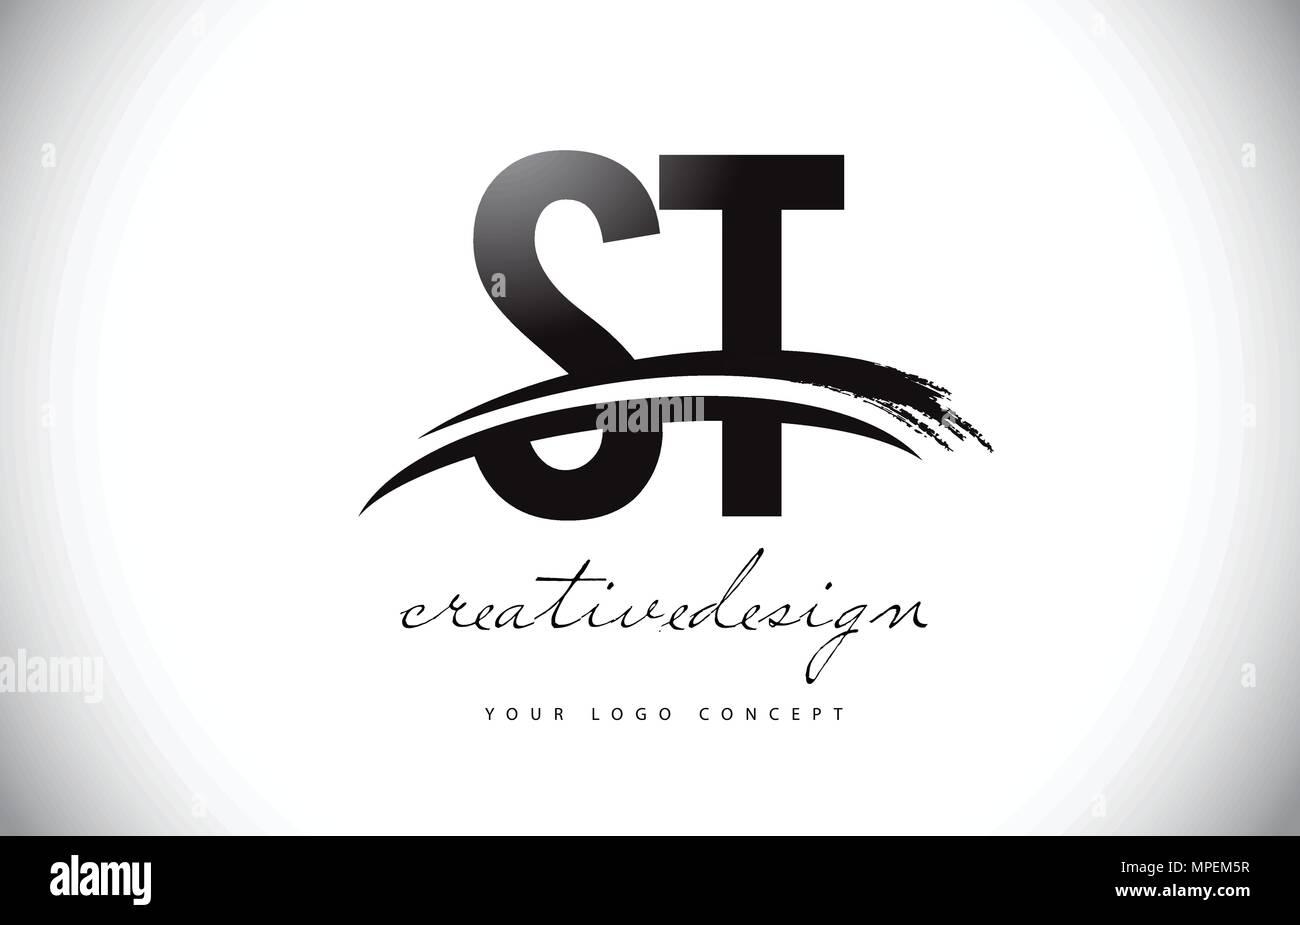 St S T Letter Logo Design With Swoosh And Black Brush Stroke